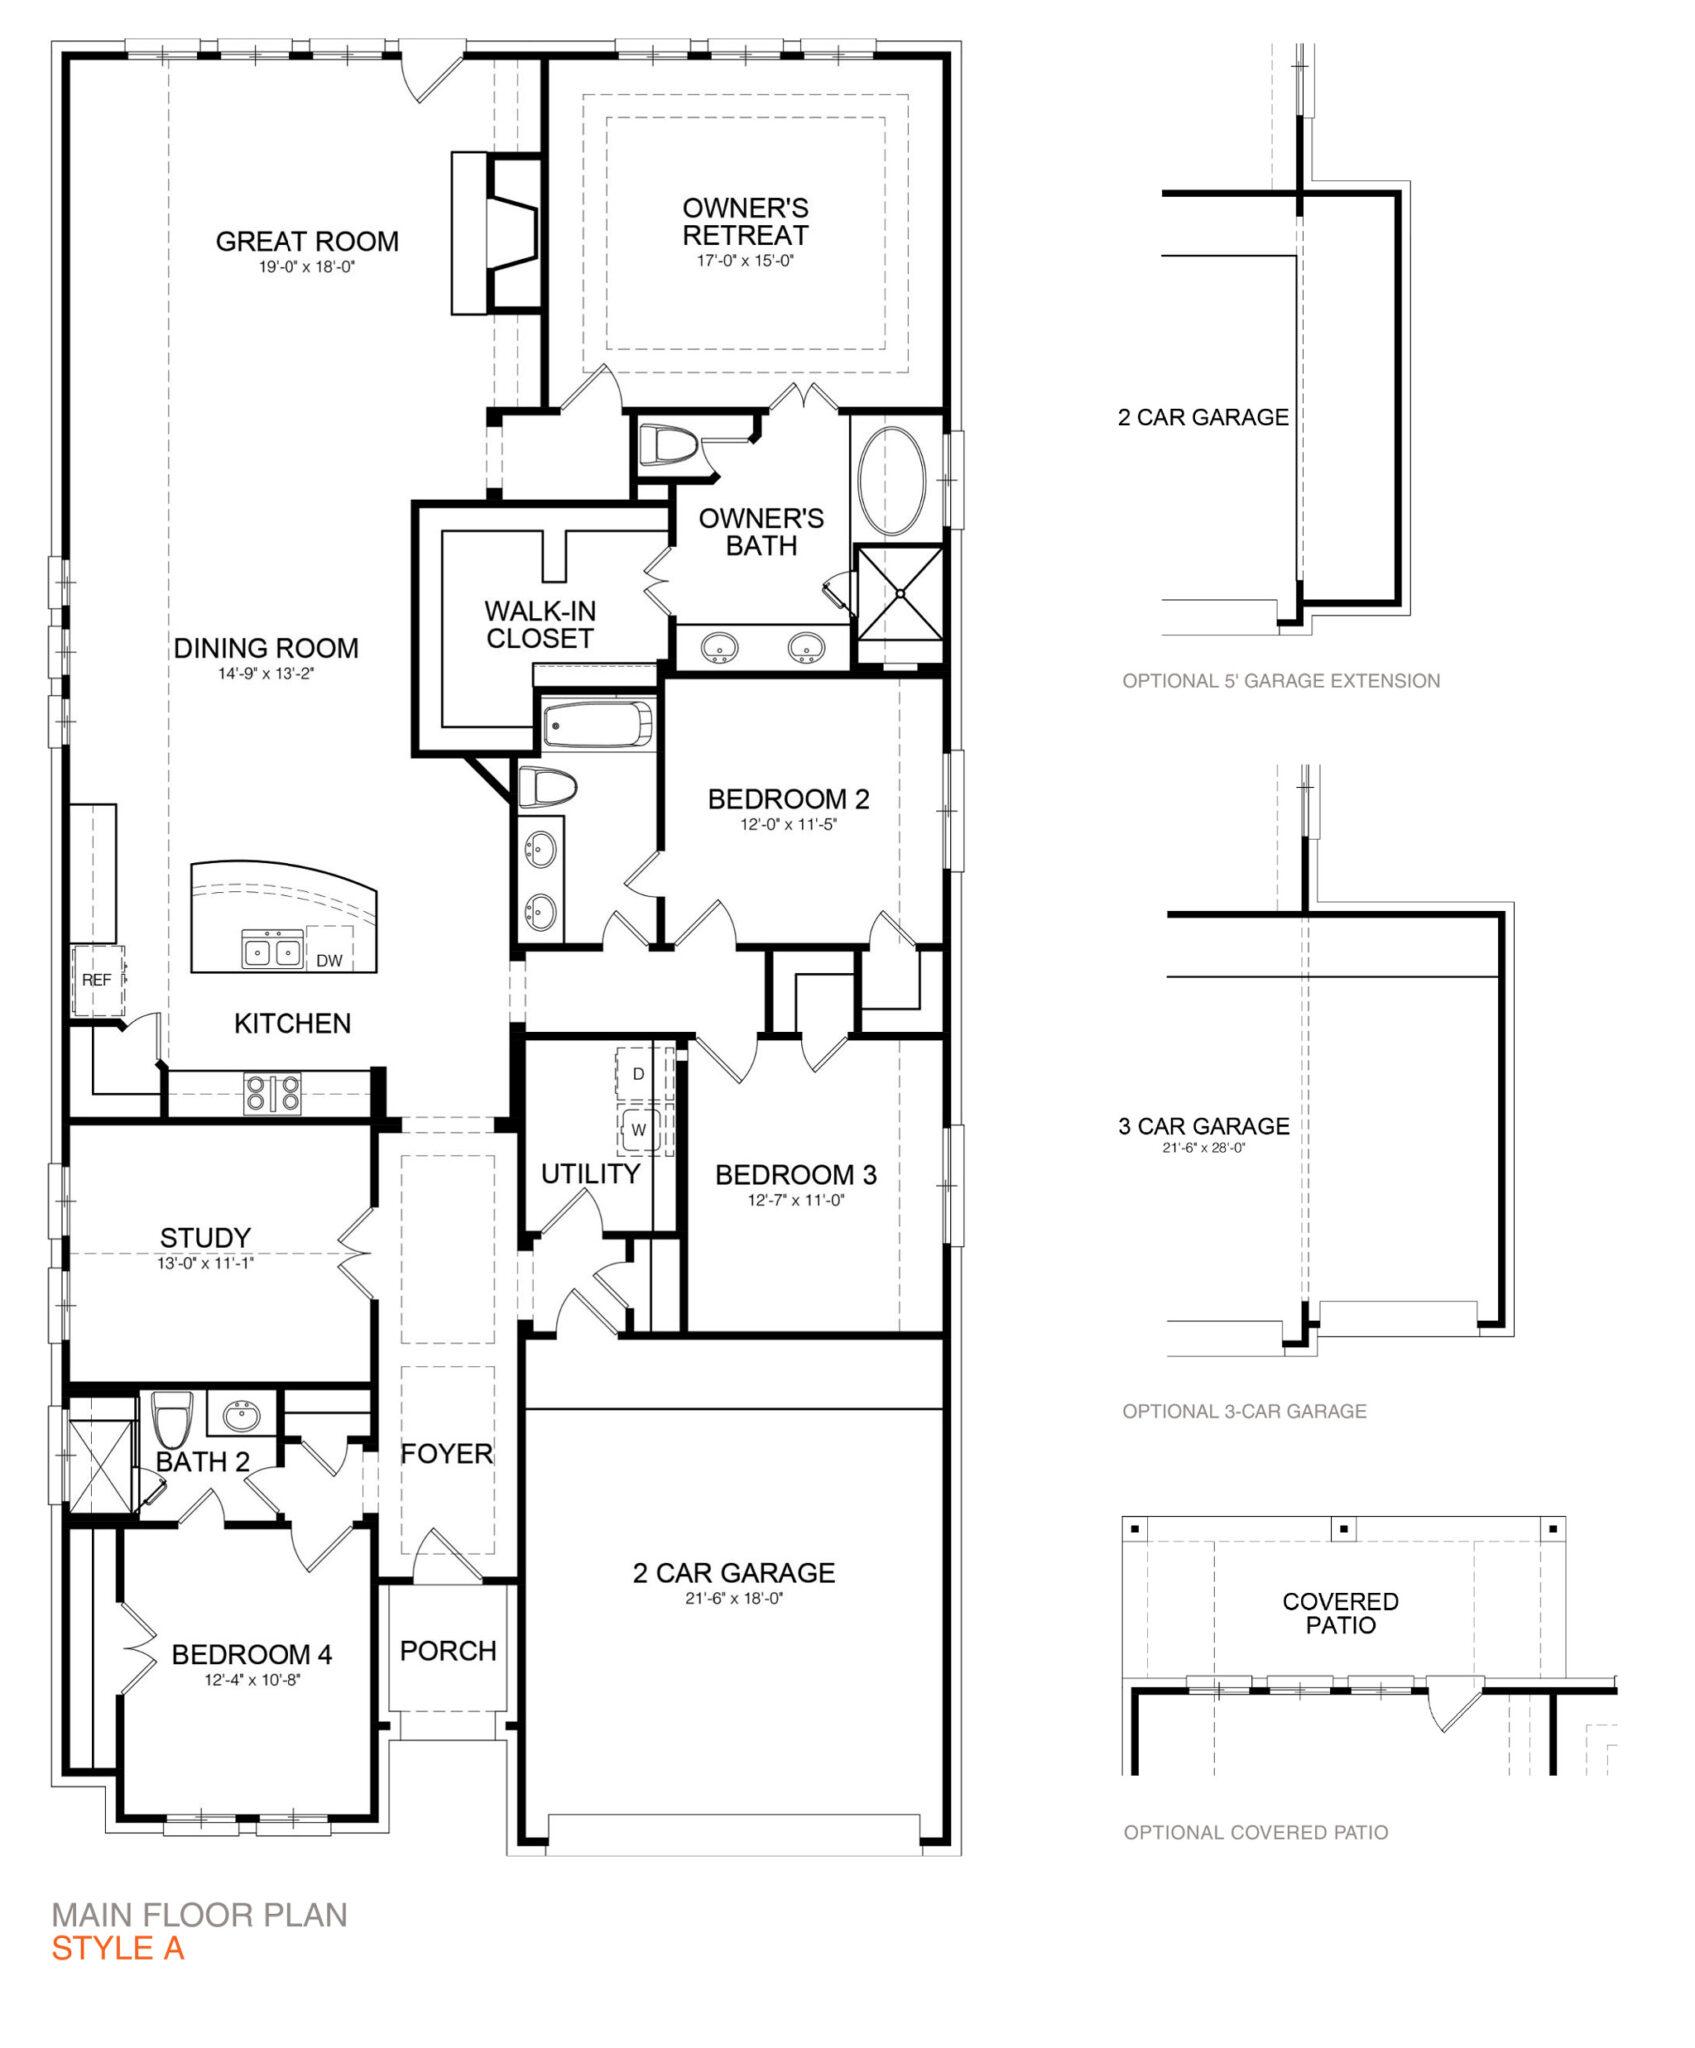 Victoria-UPDATED-JUNe21-50-06-Floorplan-Insert-2-2